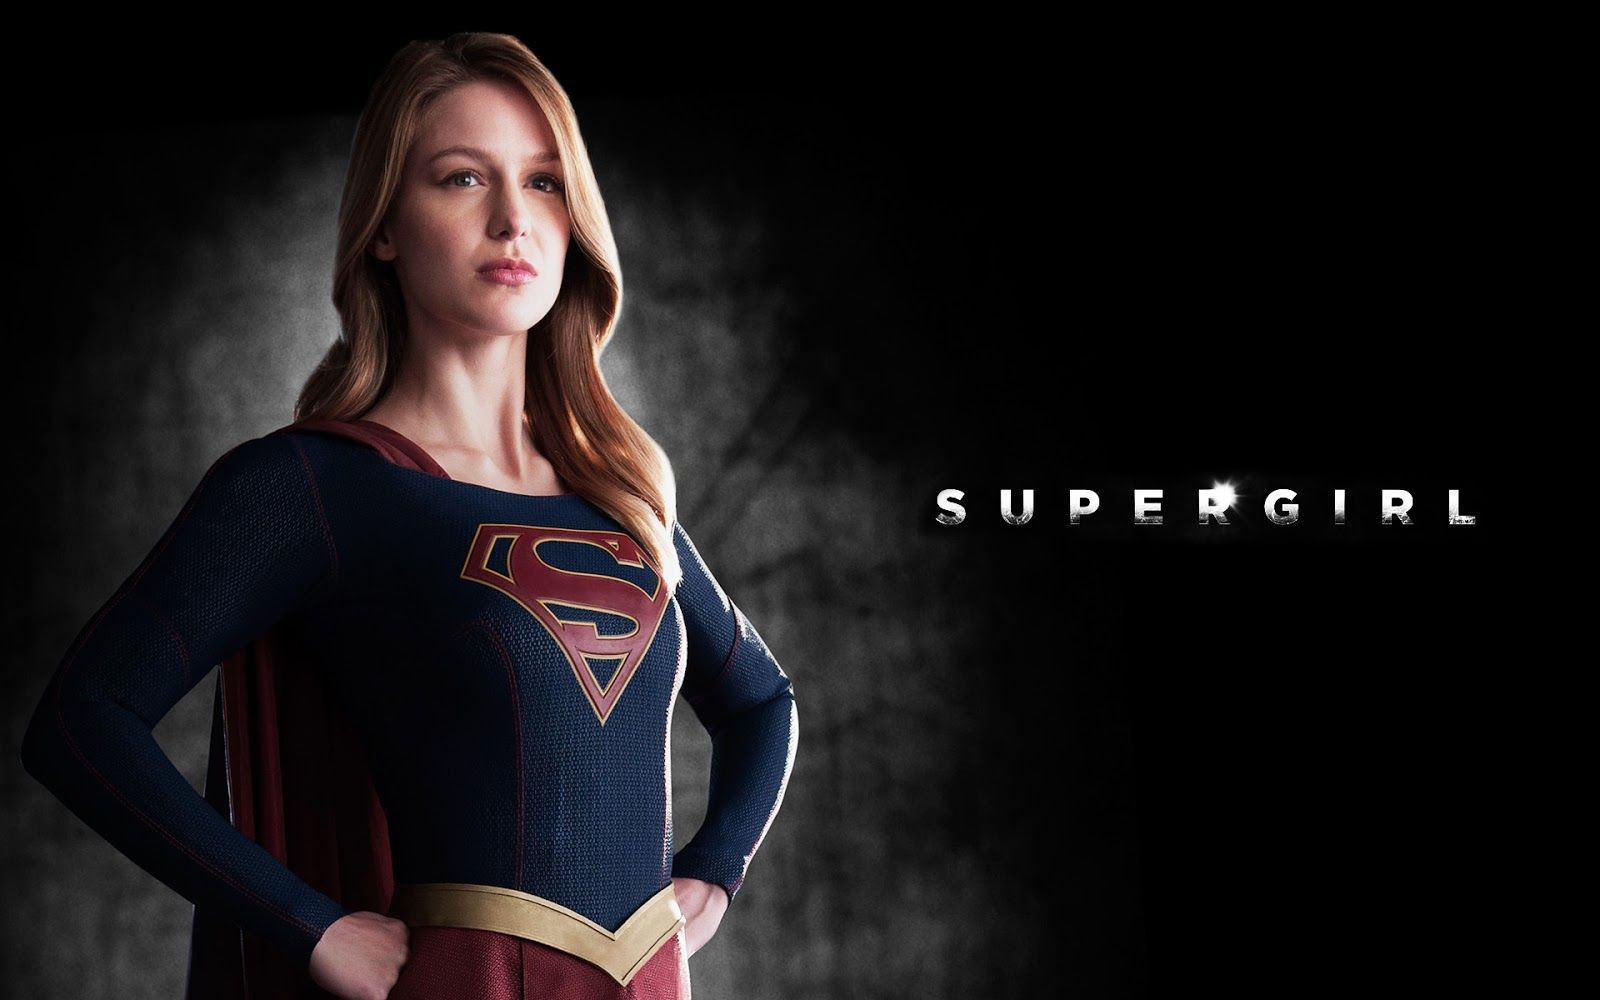 supergirl hd - photo #20